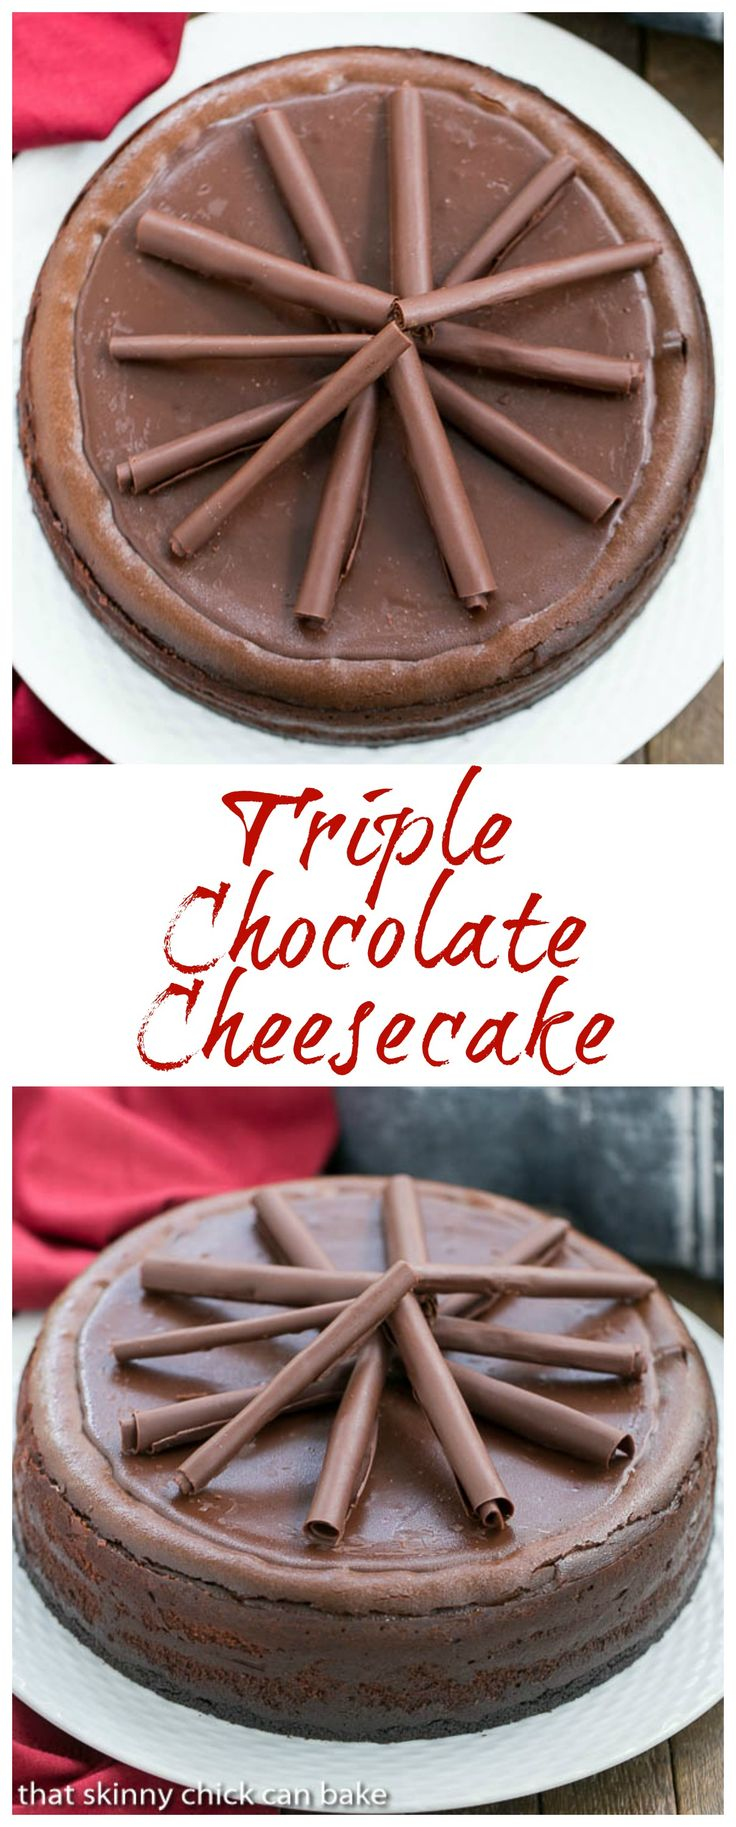 Triple Chocolate Cheesecake | A dreamy, chocolate lover's dessert! @lizzydo